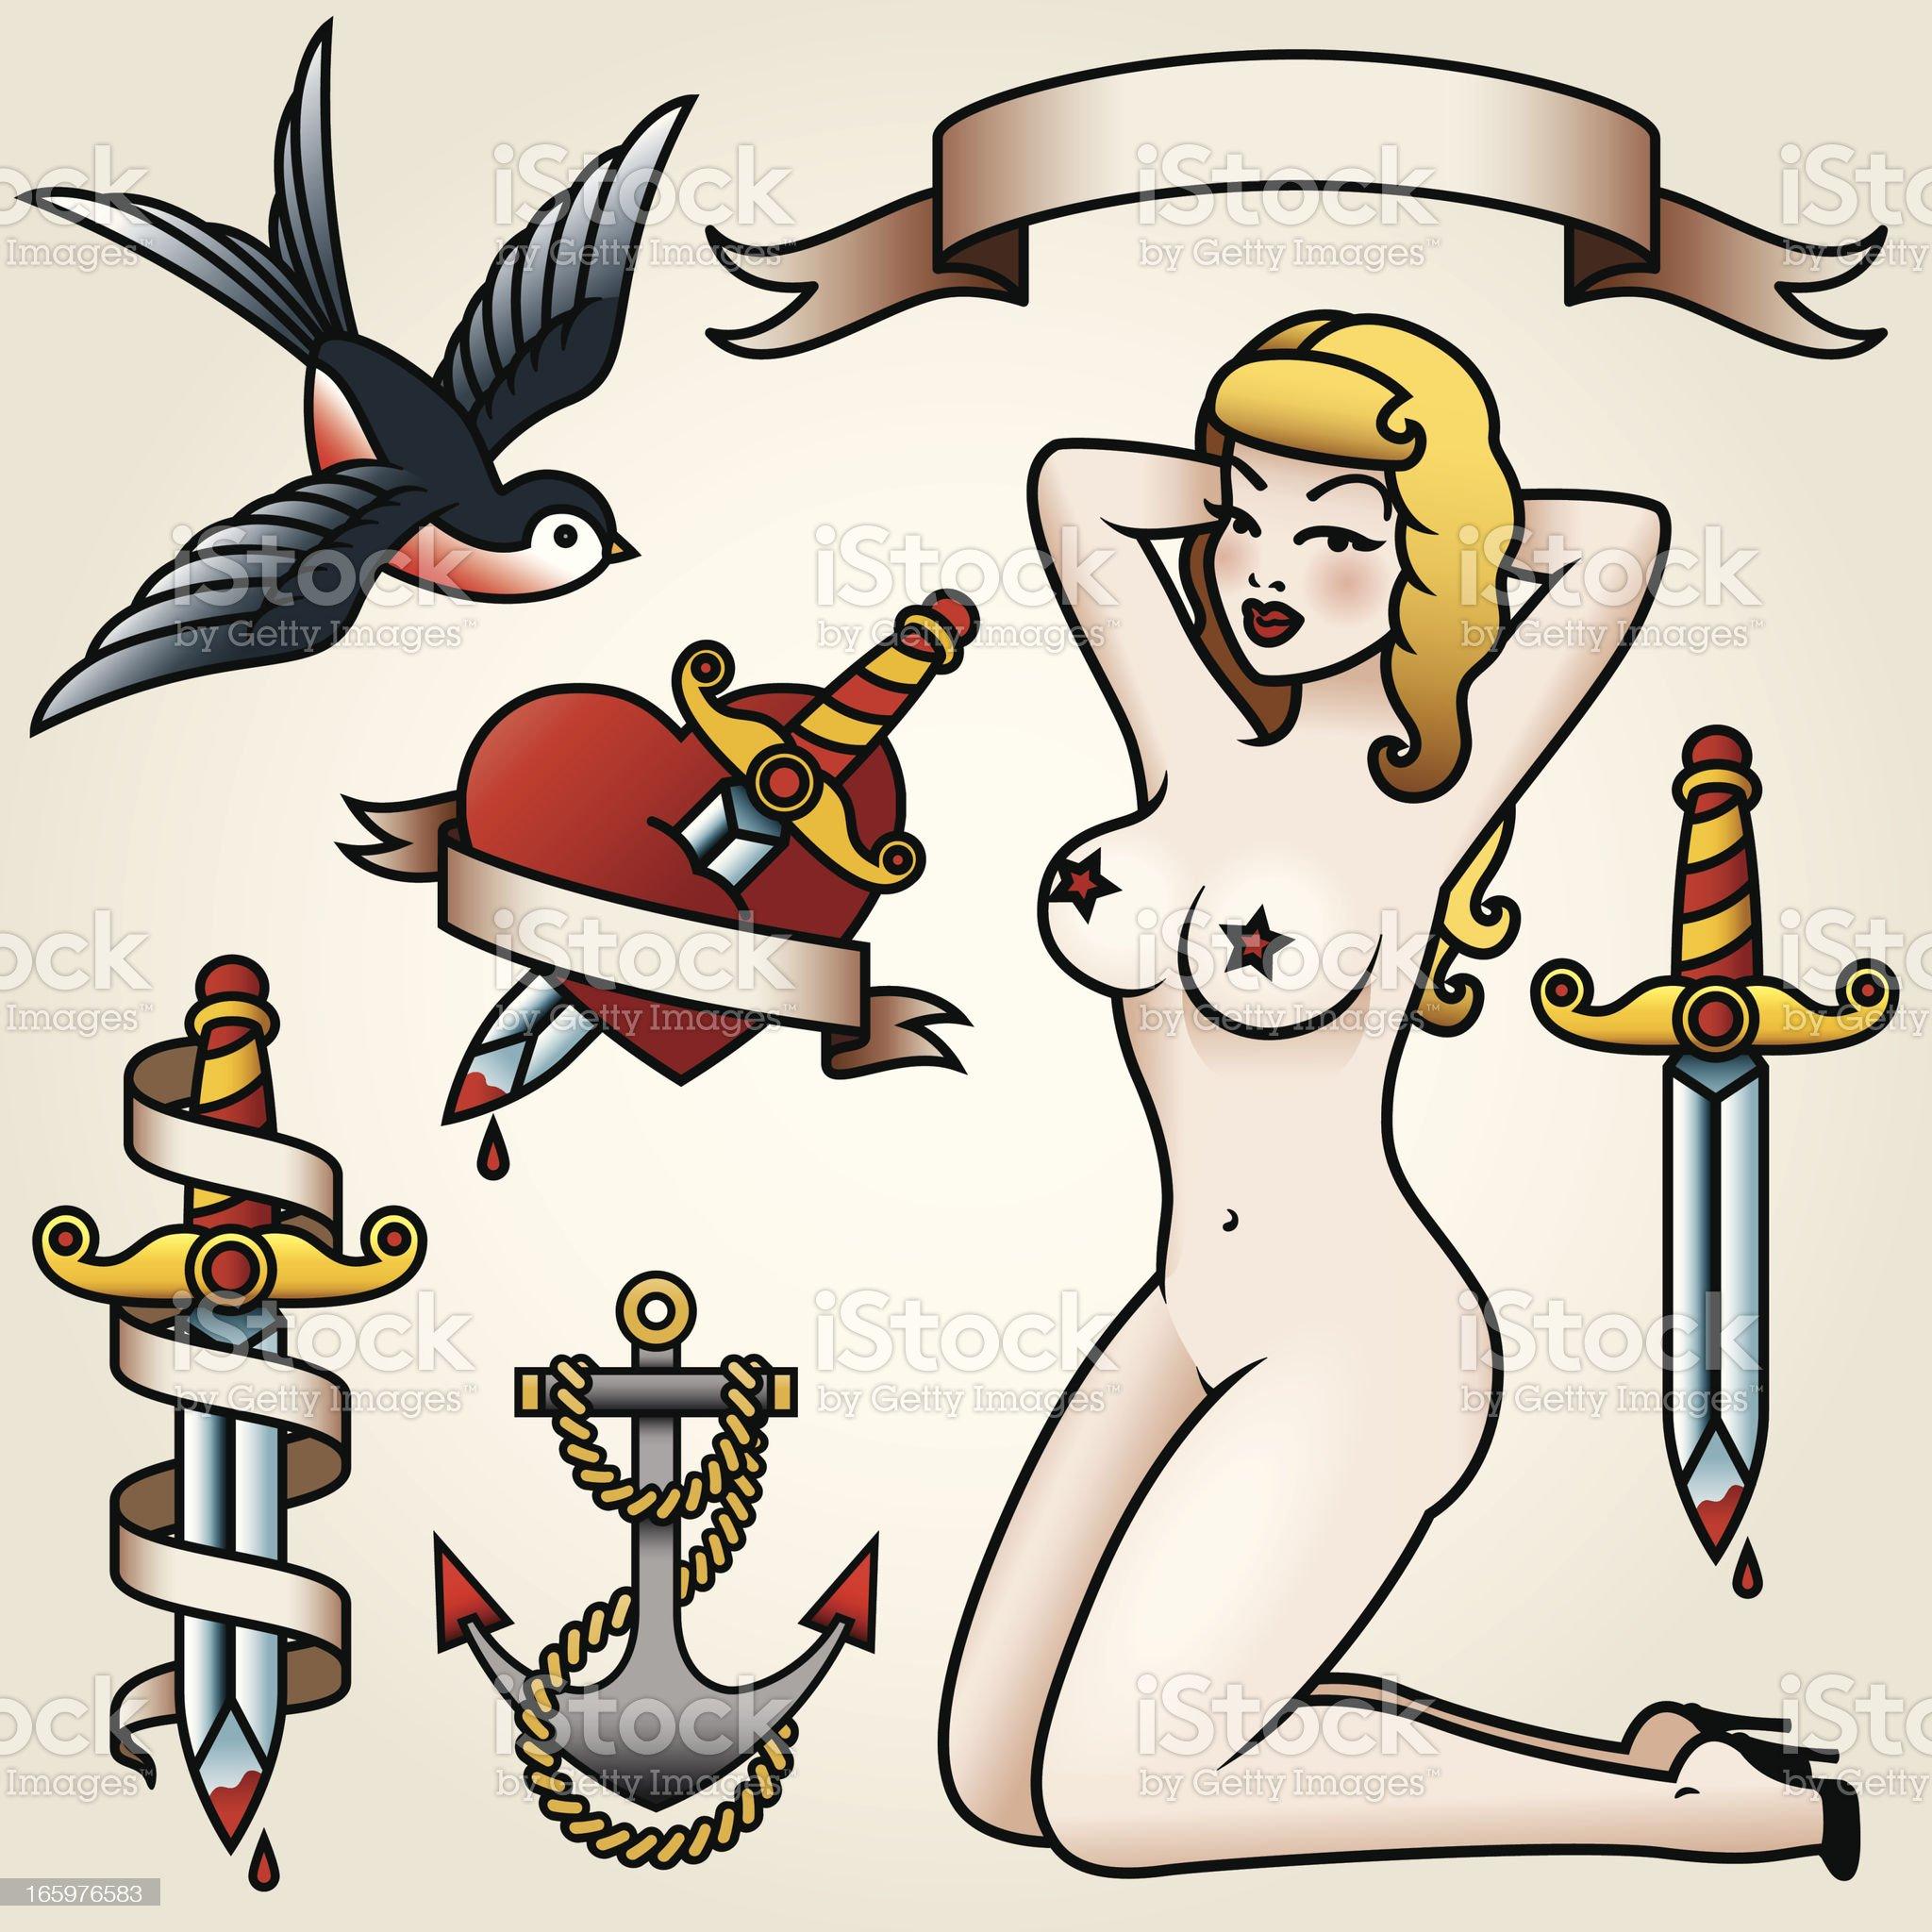 Vintage Tattoo-Style Icon Set royalty-free stock vector art